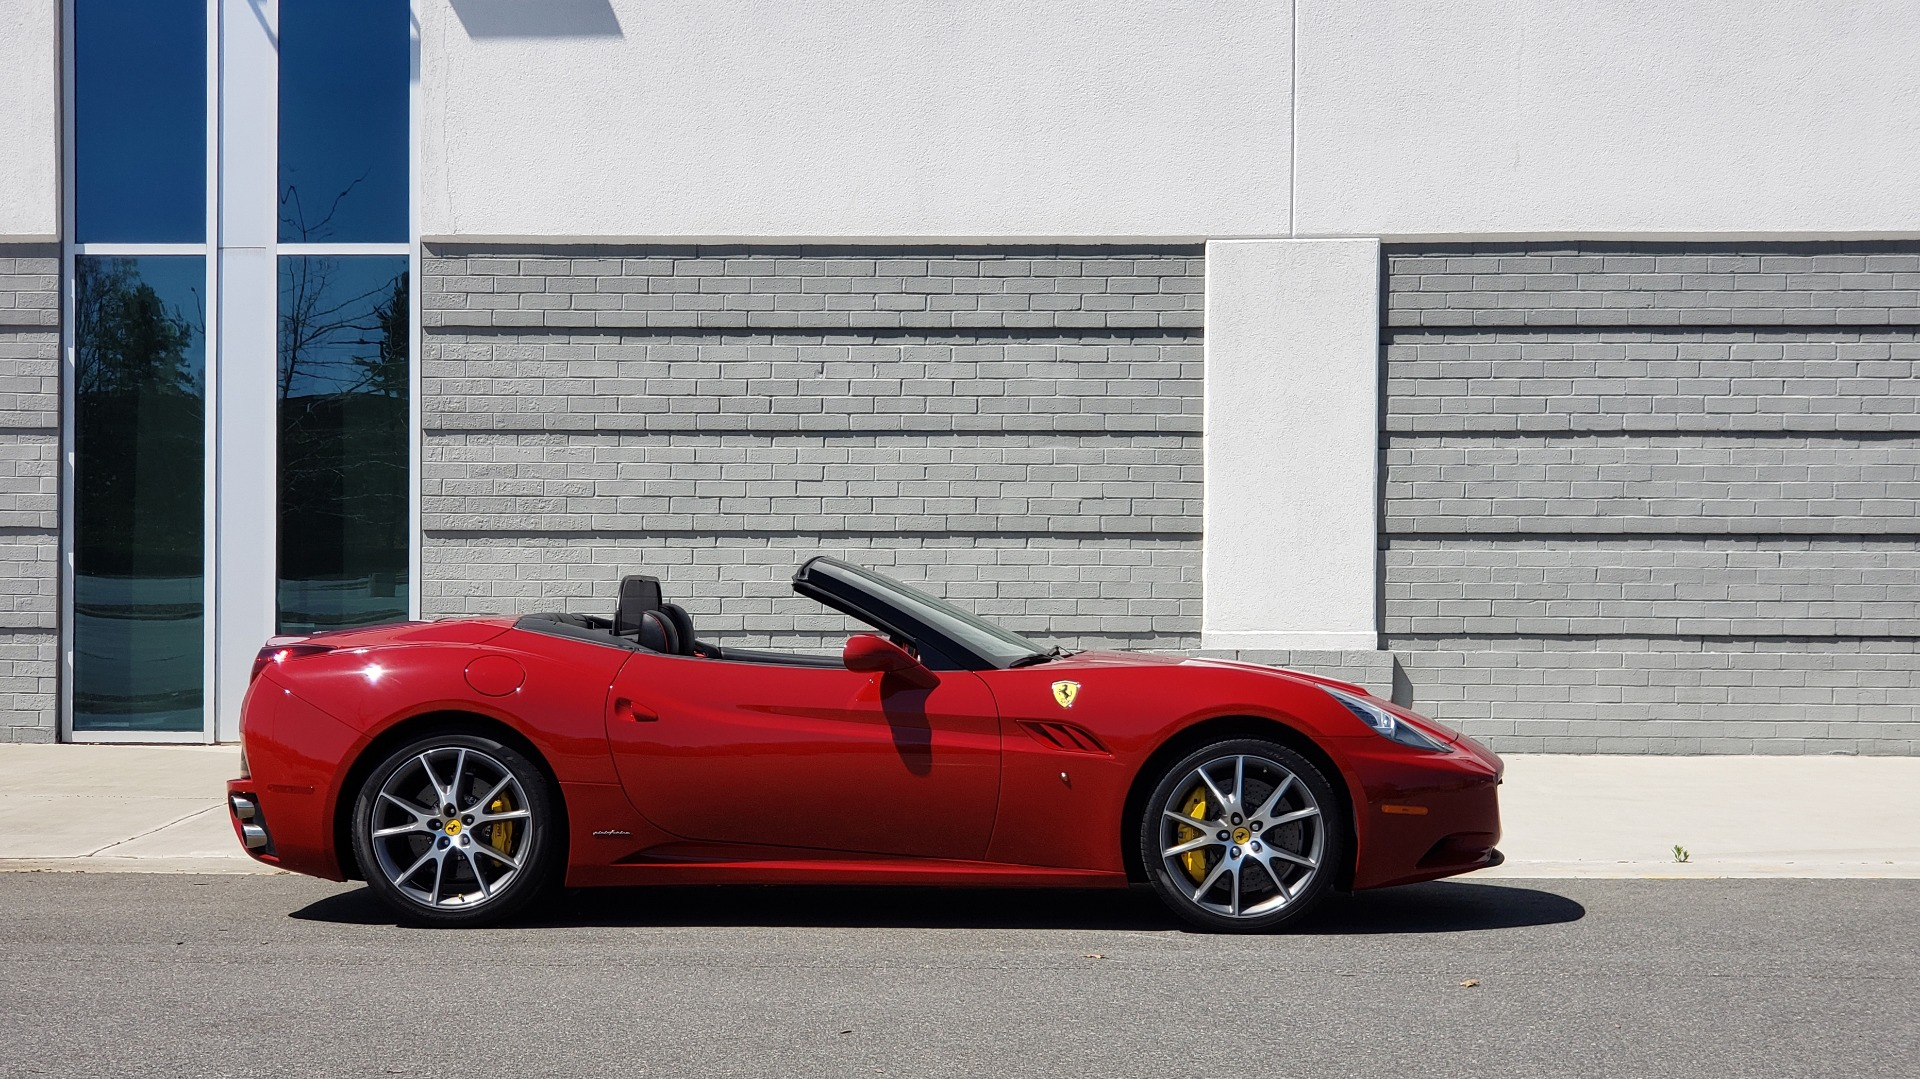 Used 2014 Ferrari CALIFORNIA CONVERTIBLE 2+2 / NAV / PARK SENS / CAMERA / TPMS for sale Sold at Formula Imports in Charlotte NC 28227 14